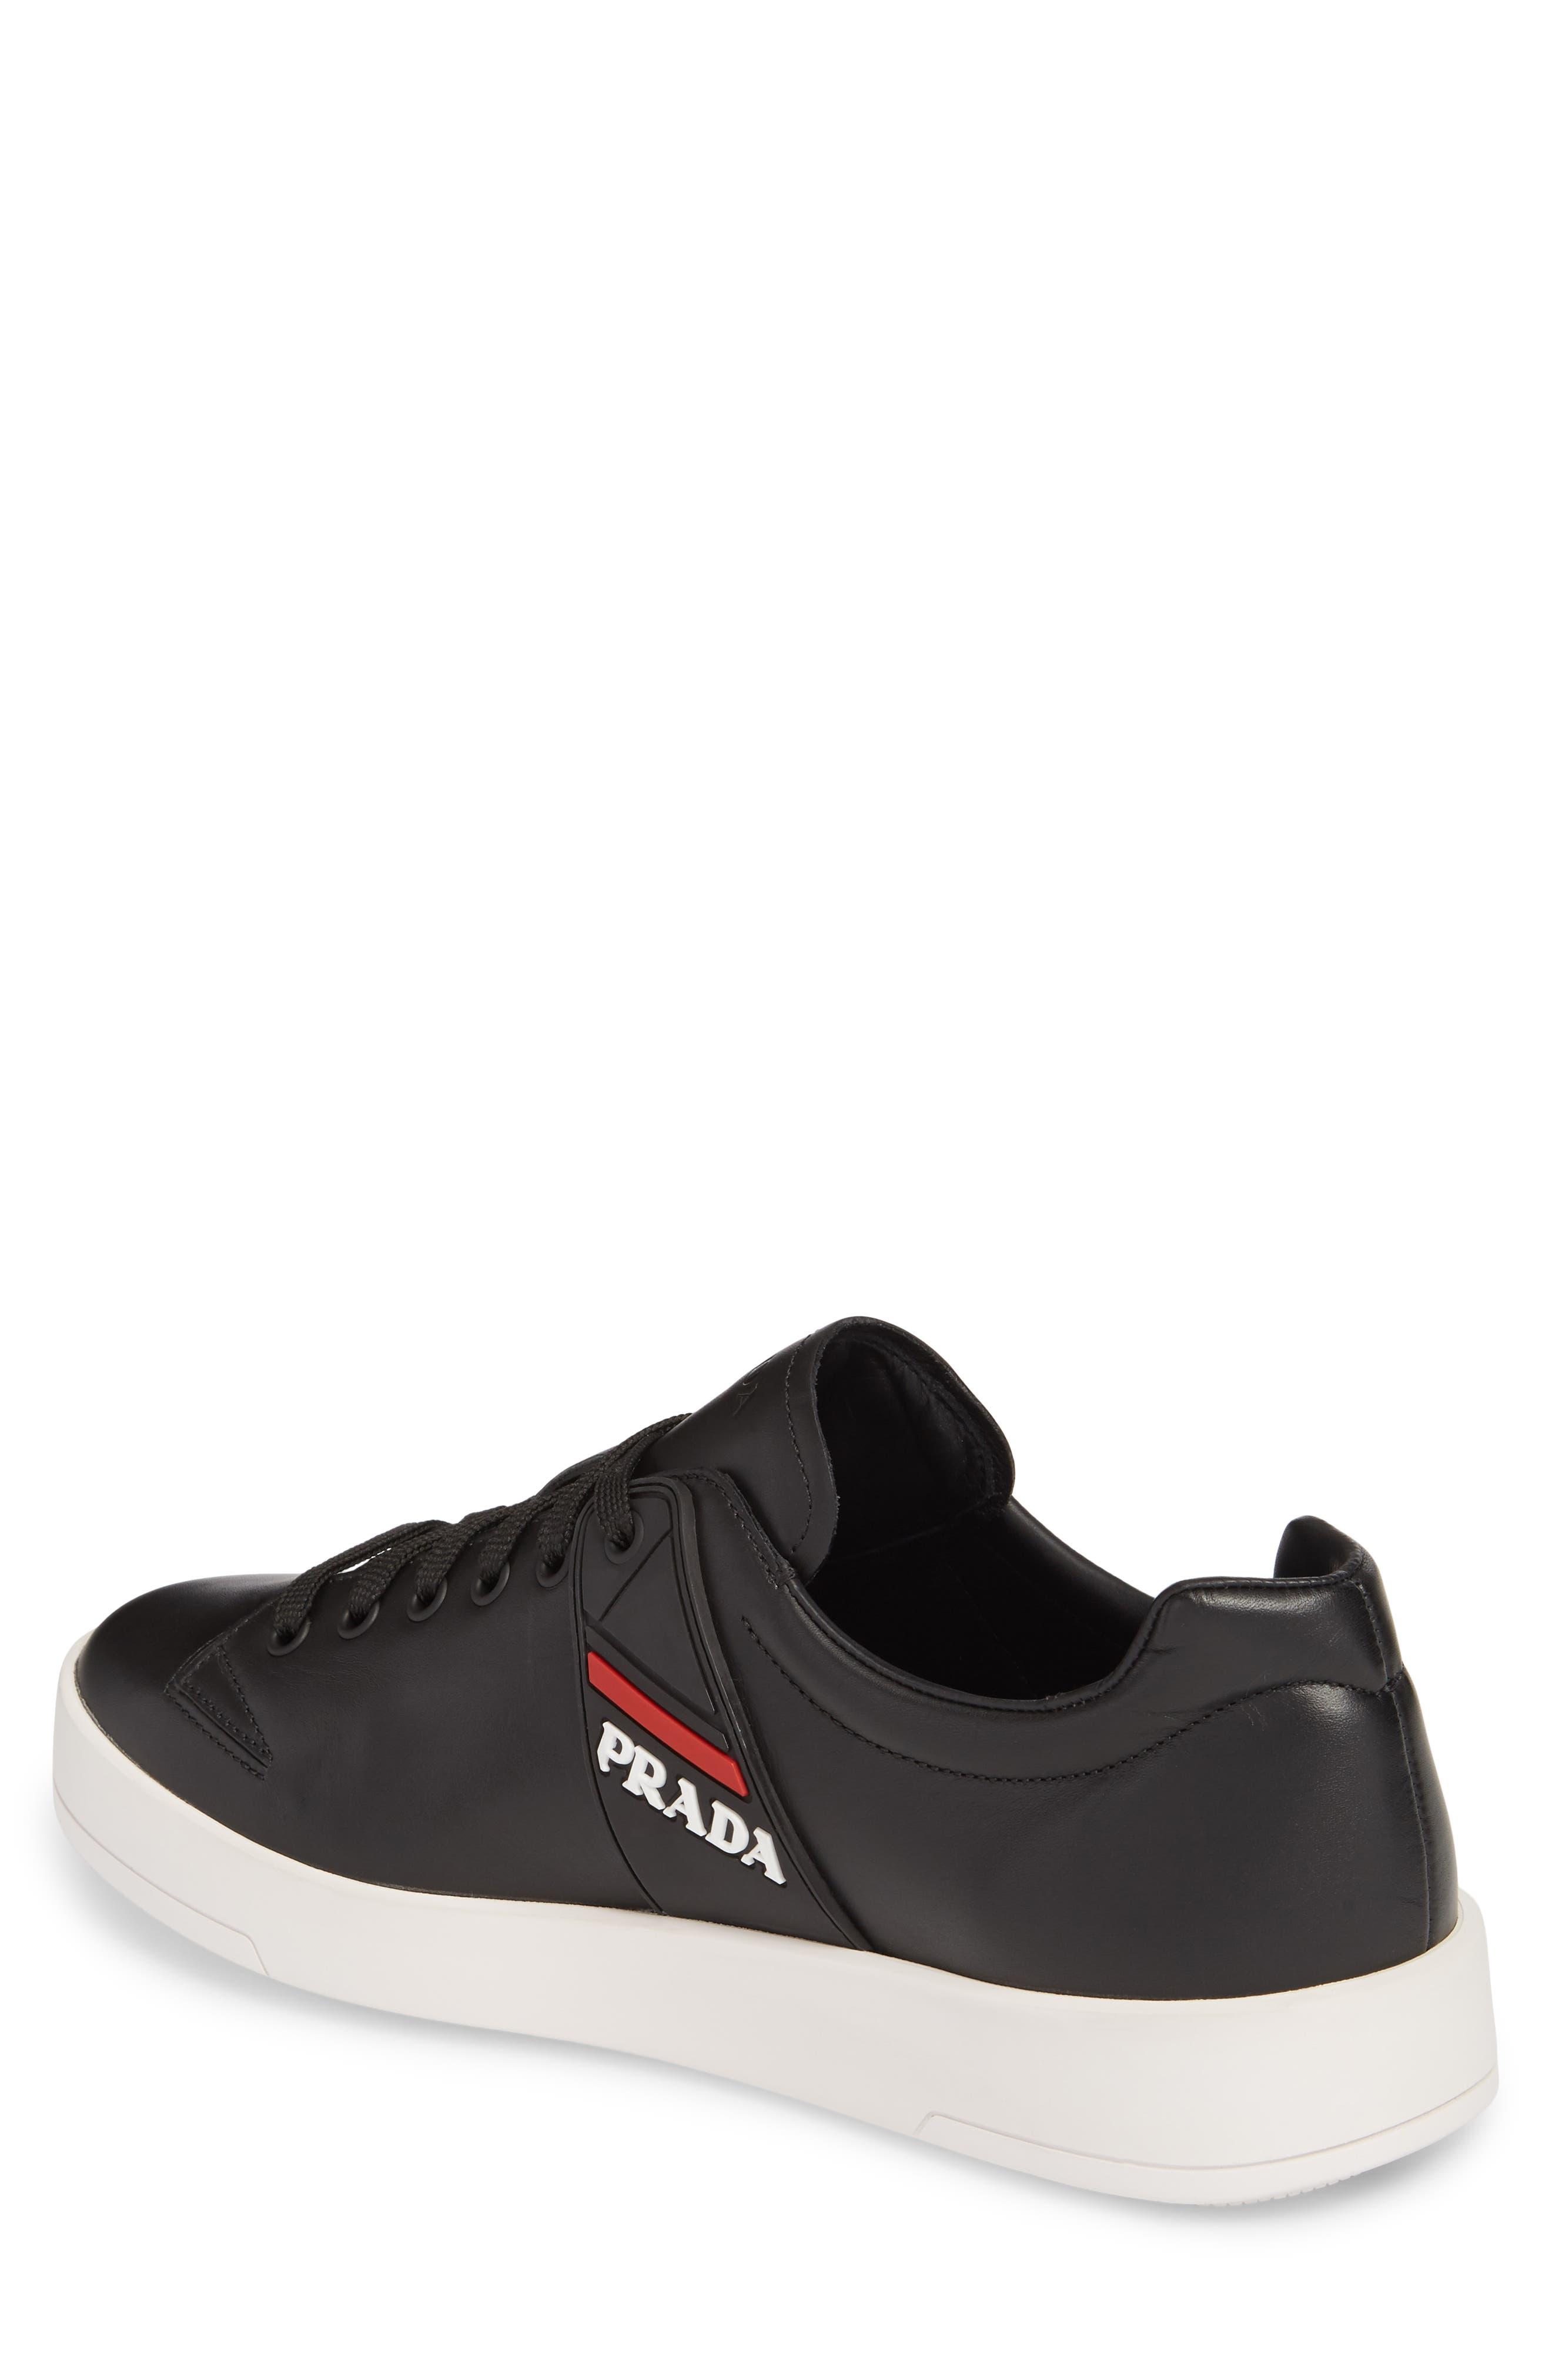 Linea Rossa Sneaker,                             Alternate thumbnail 2, color,                             Nero Bianco